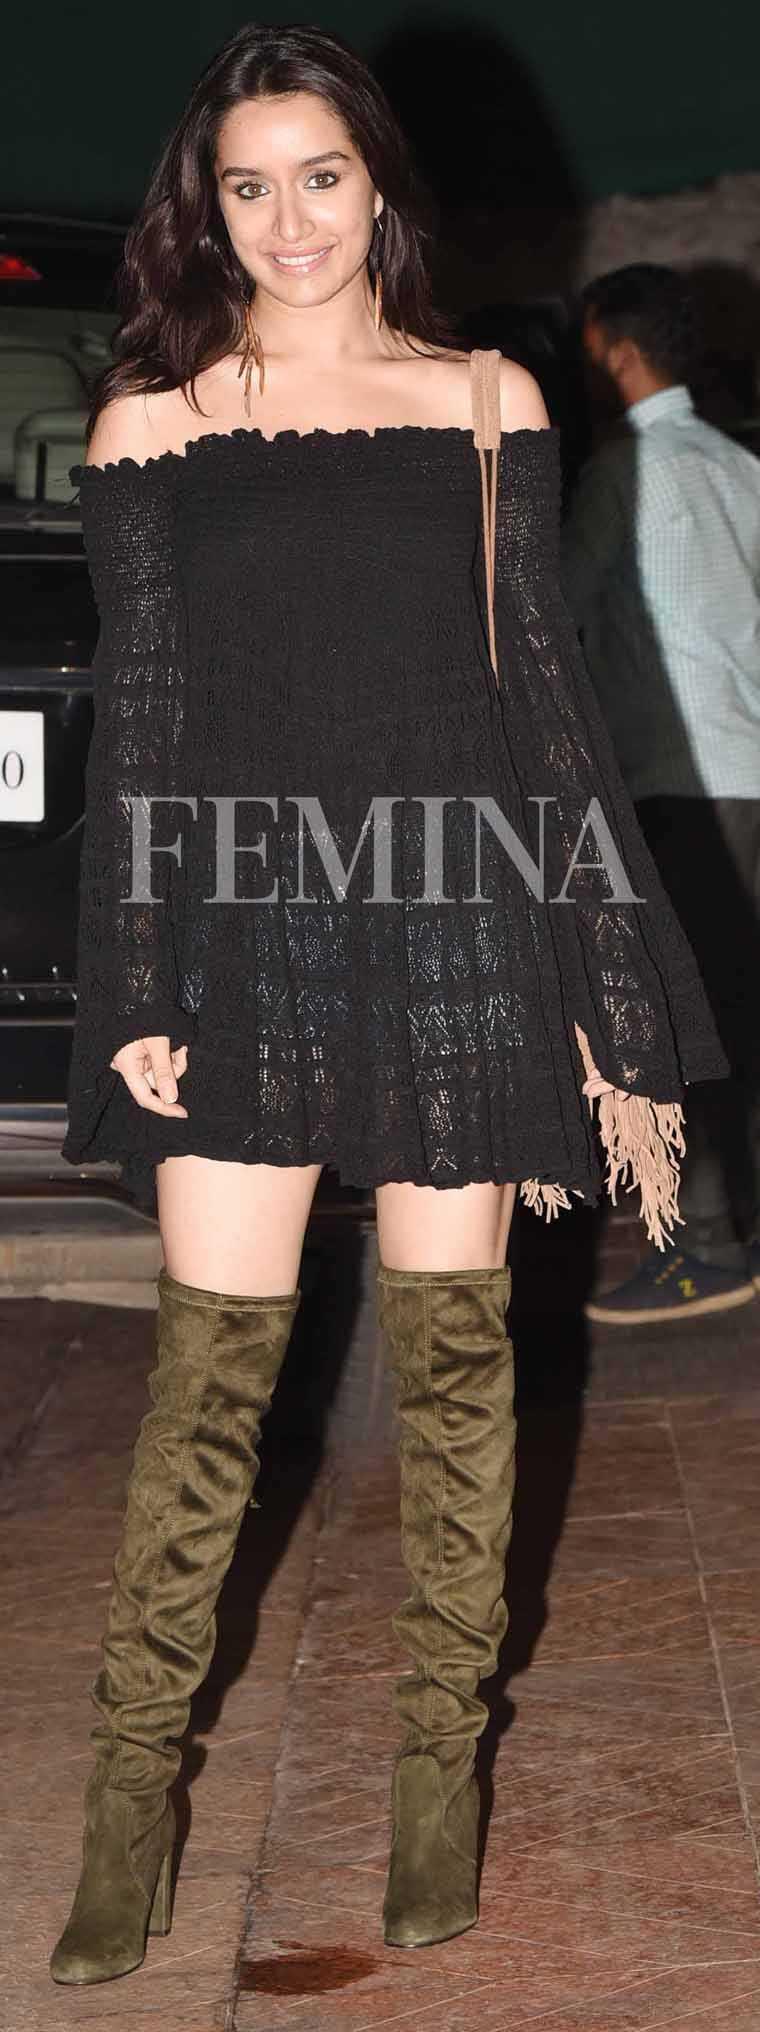 Shraddha-Kapoor-lace-dress-denim-shorts-thigh-high-boots